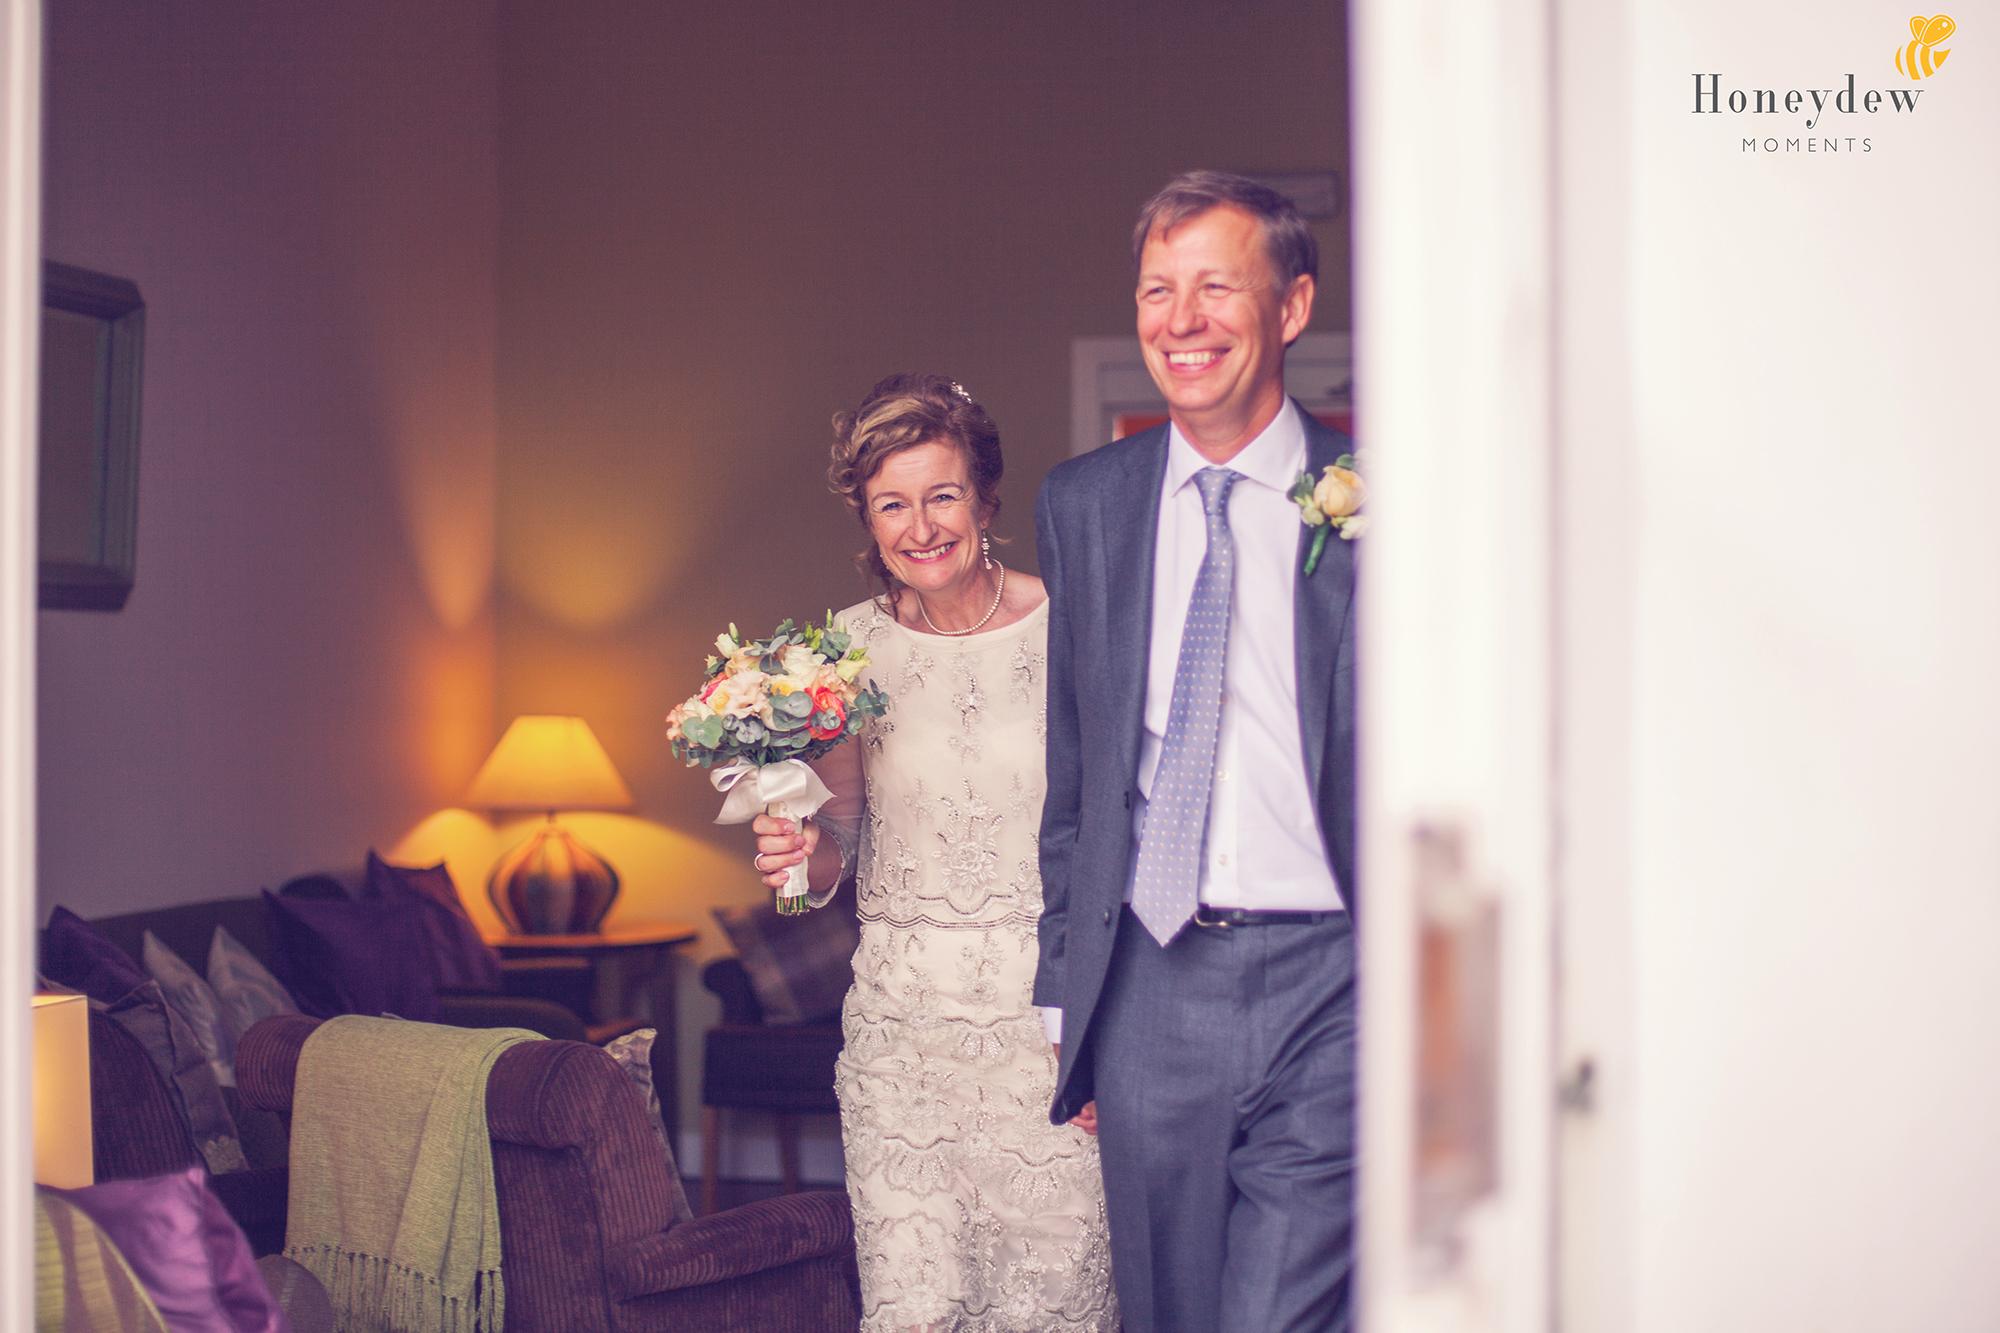 an older bride and groom walk through hotel doors